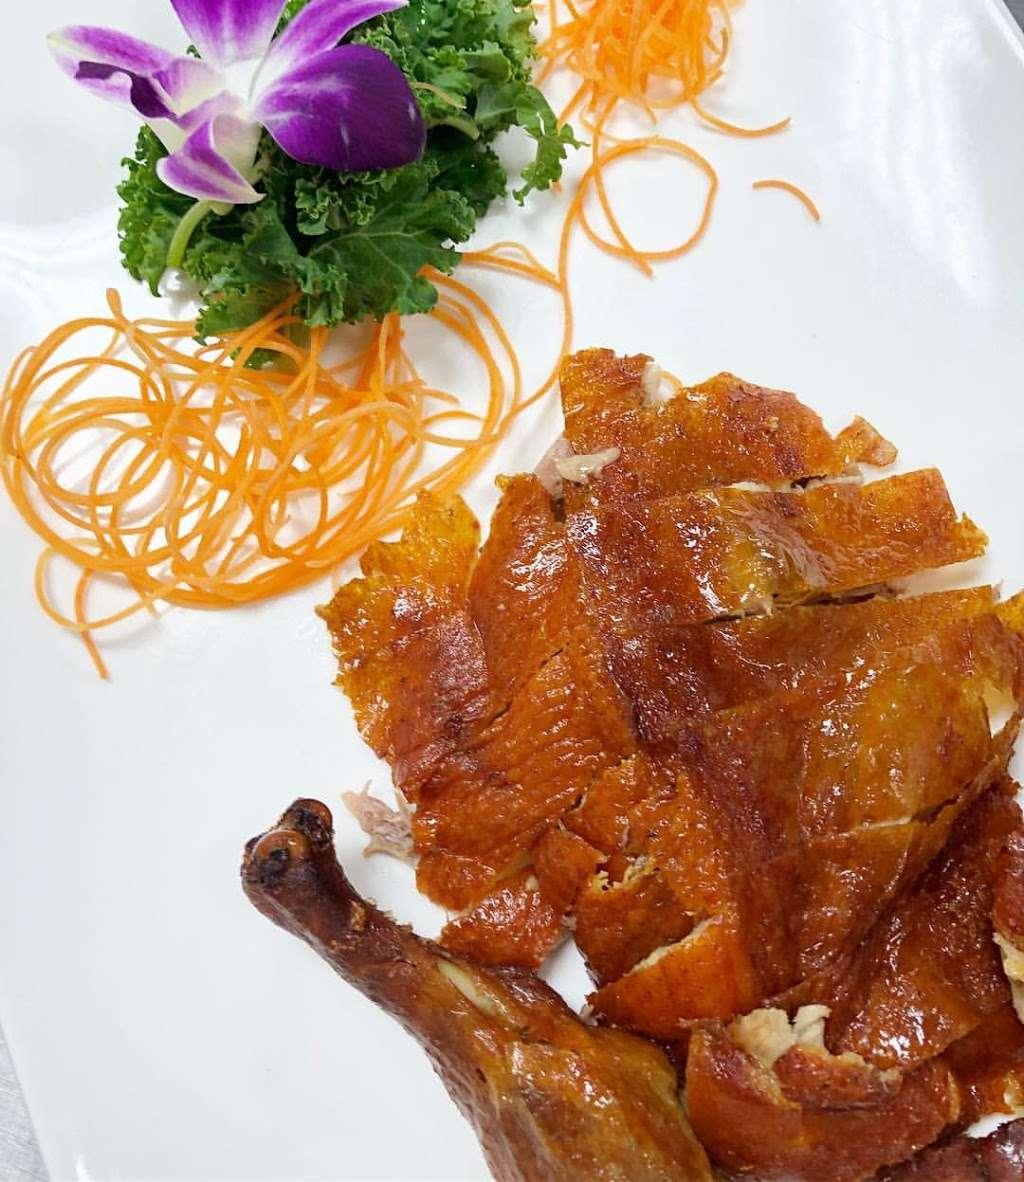 Buddha Asian Bistro - restaurant  | Photo 2 of 10 | Address: 55 Hamilton St, Dobbs Ferry, NY 10522, USA | Phone: (914) 274-8348